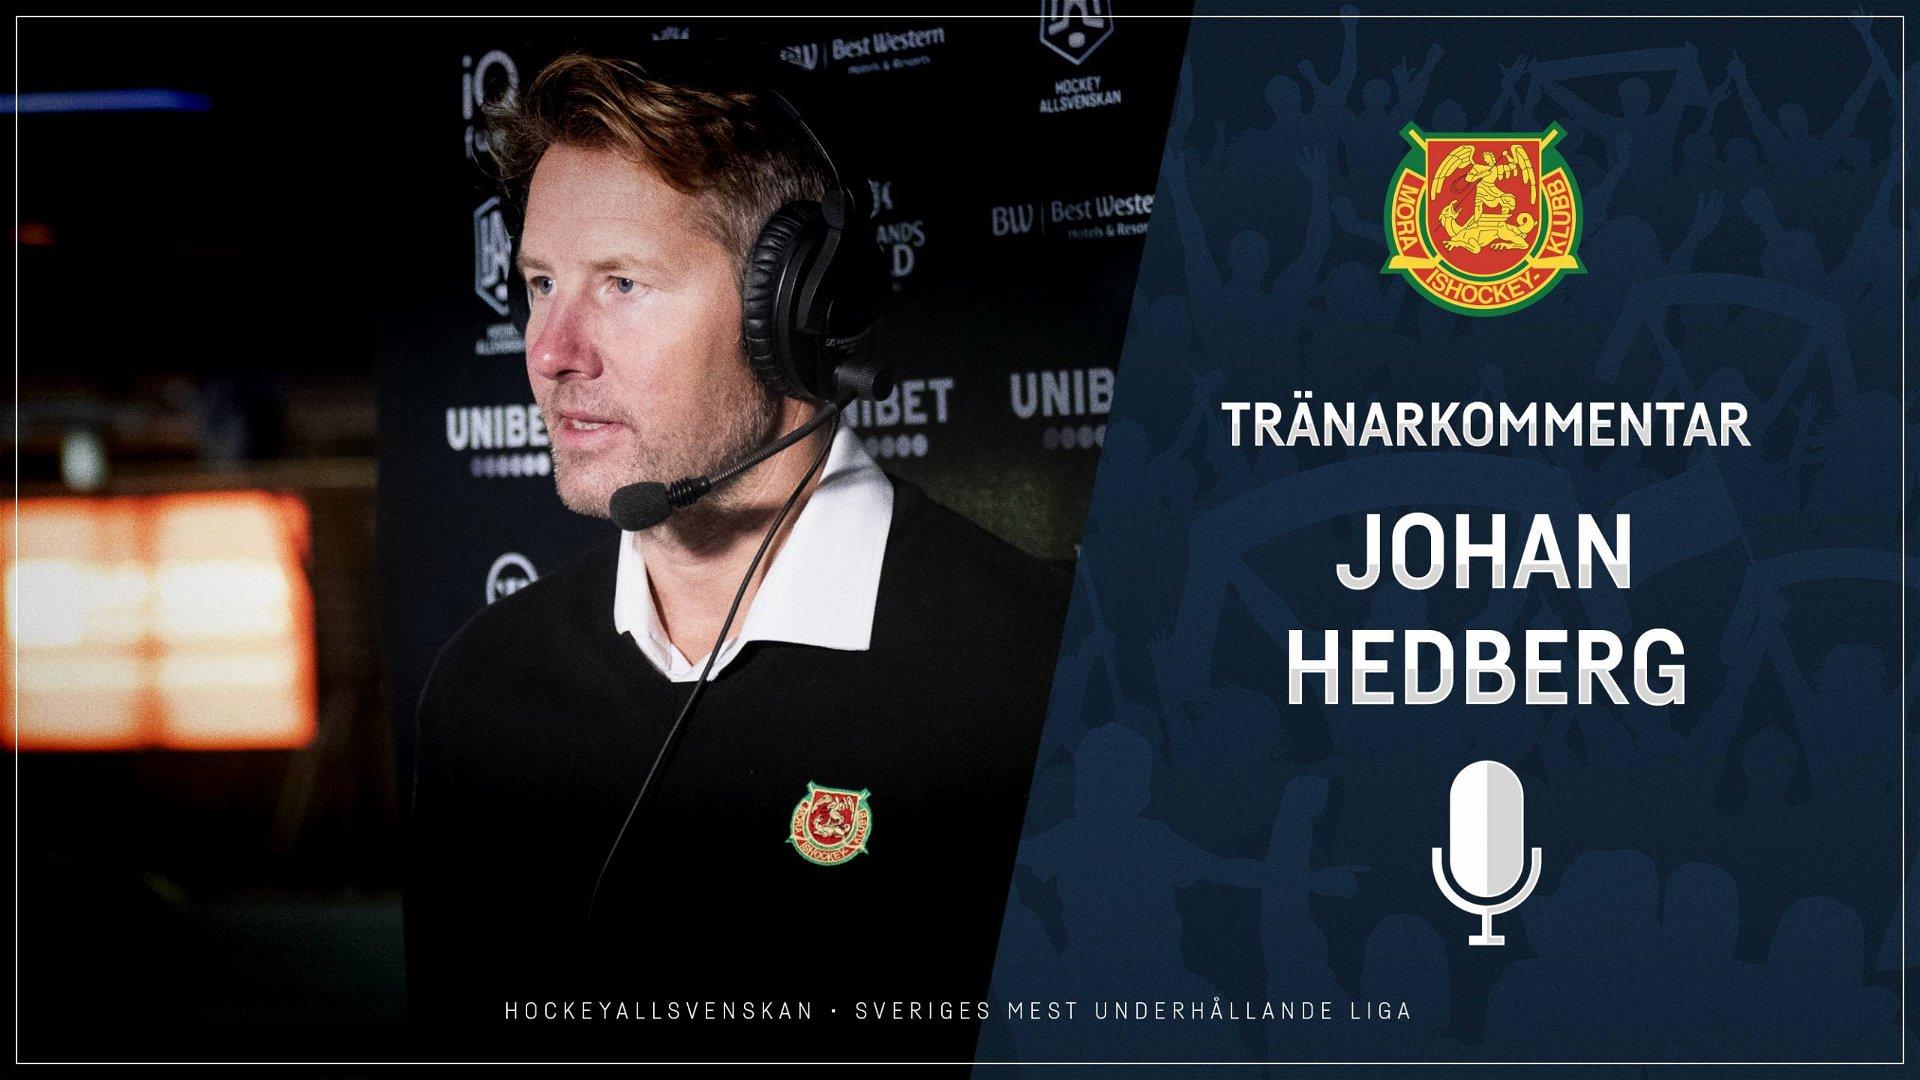 2021-02-05 Segerintervju: Johan Hedberg